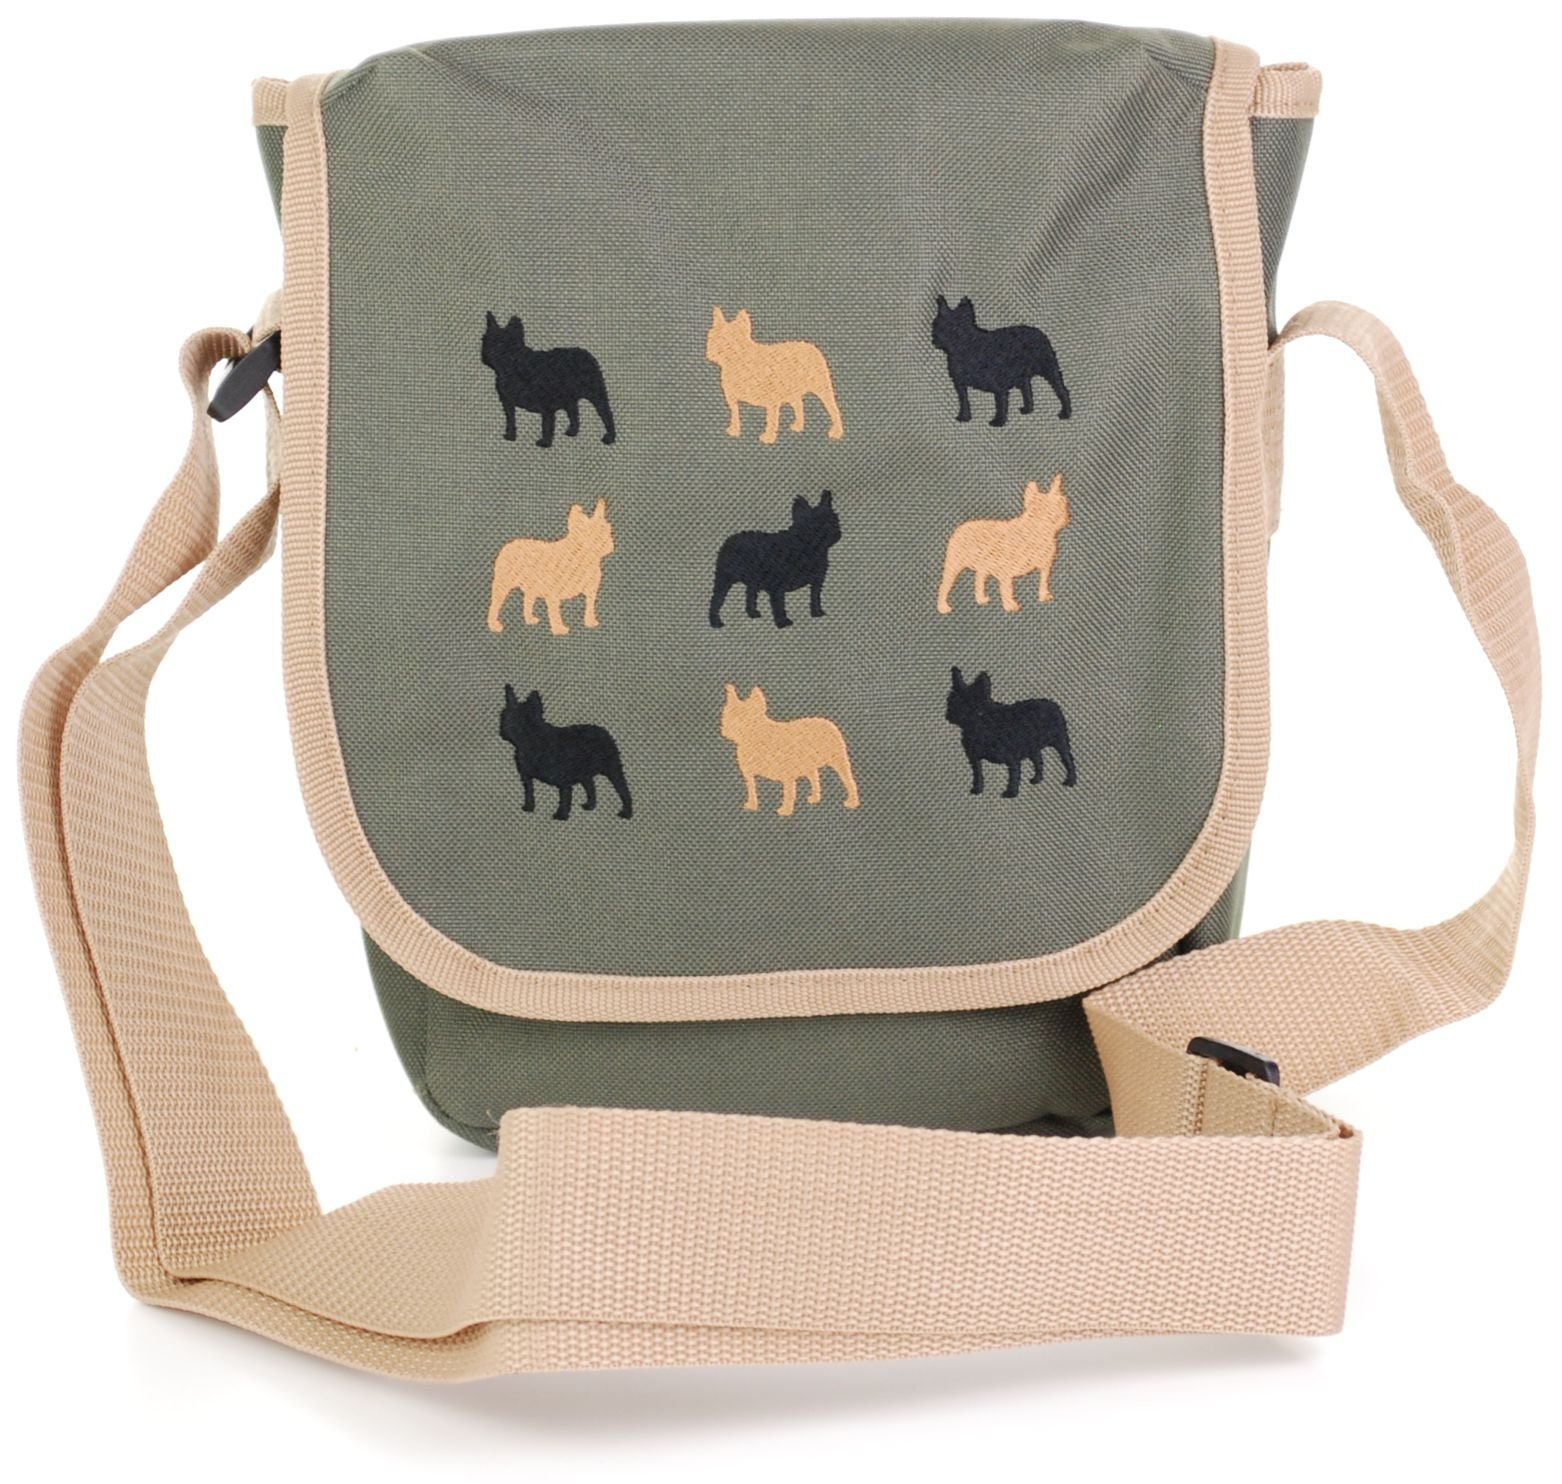 French Bulldog Cross-body Bag